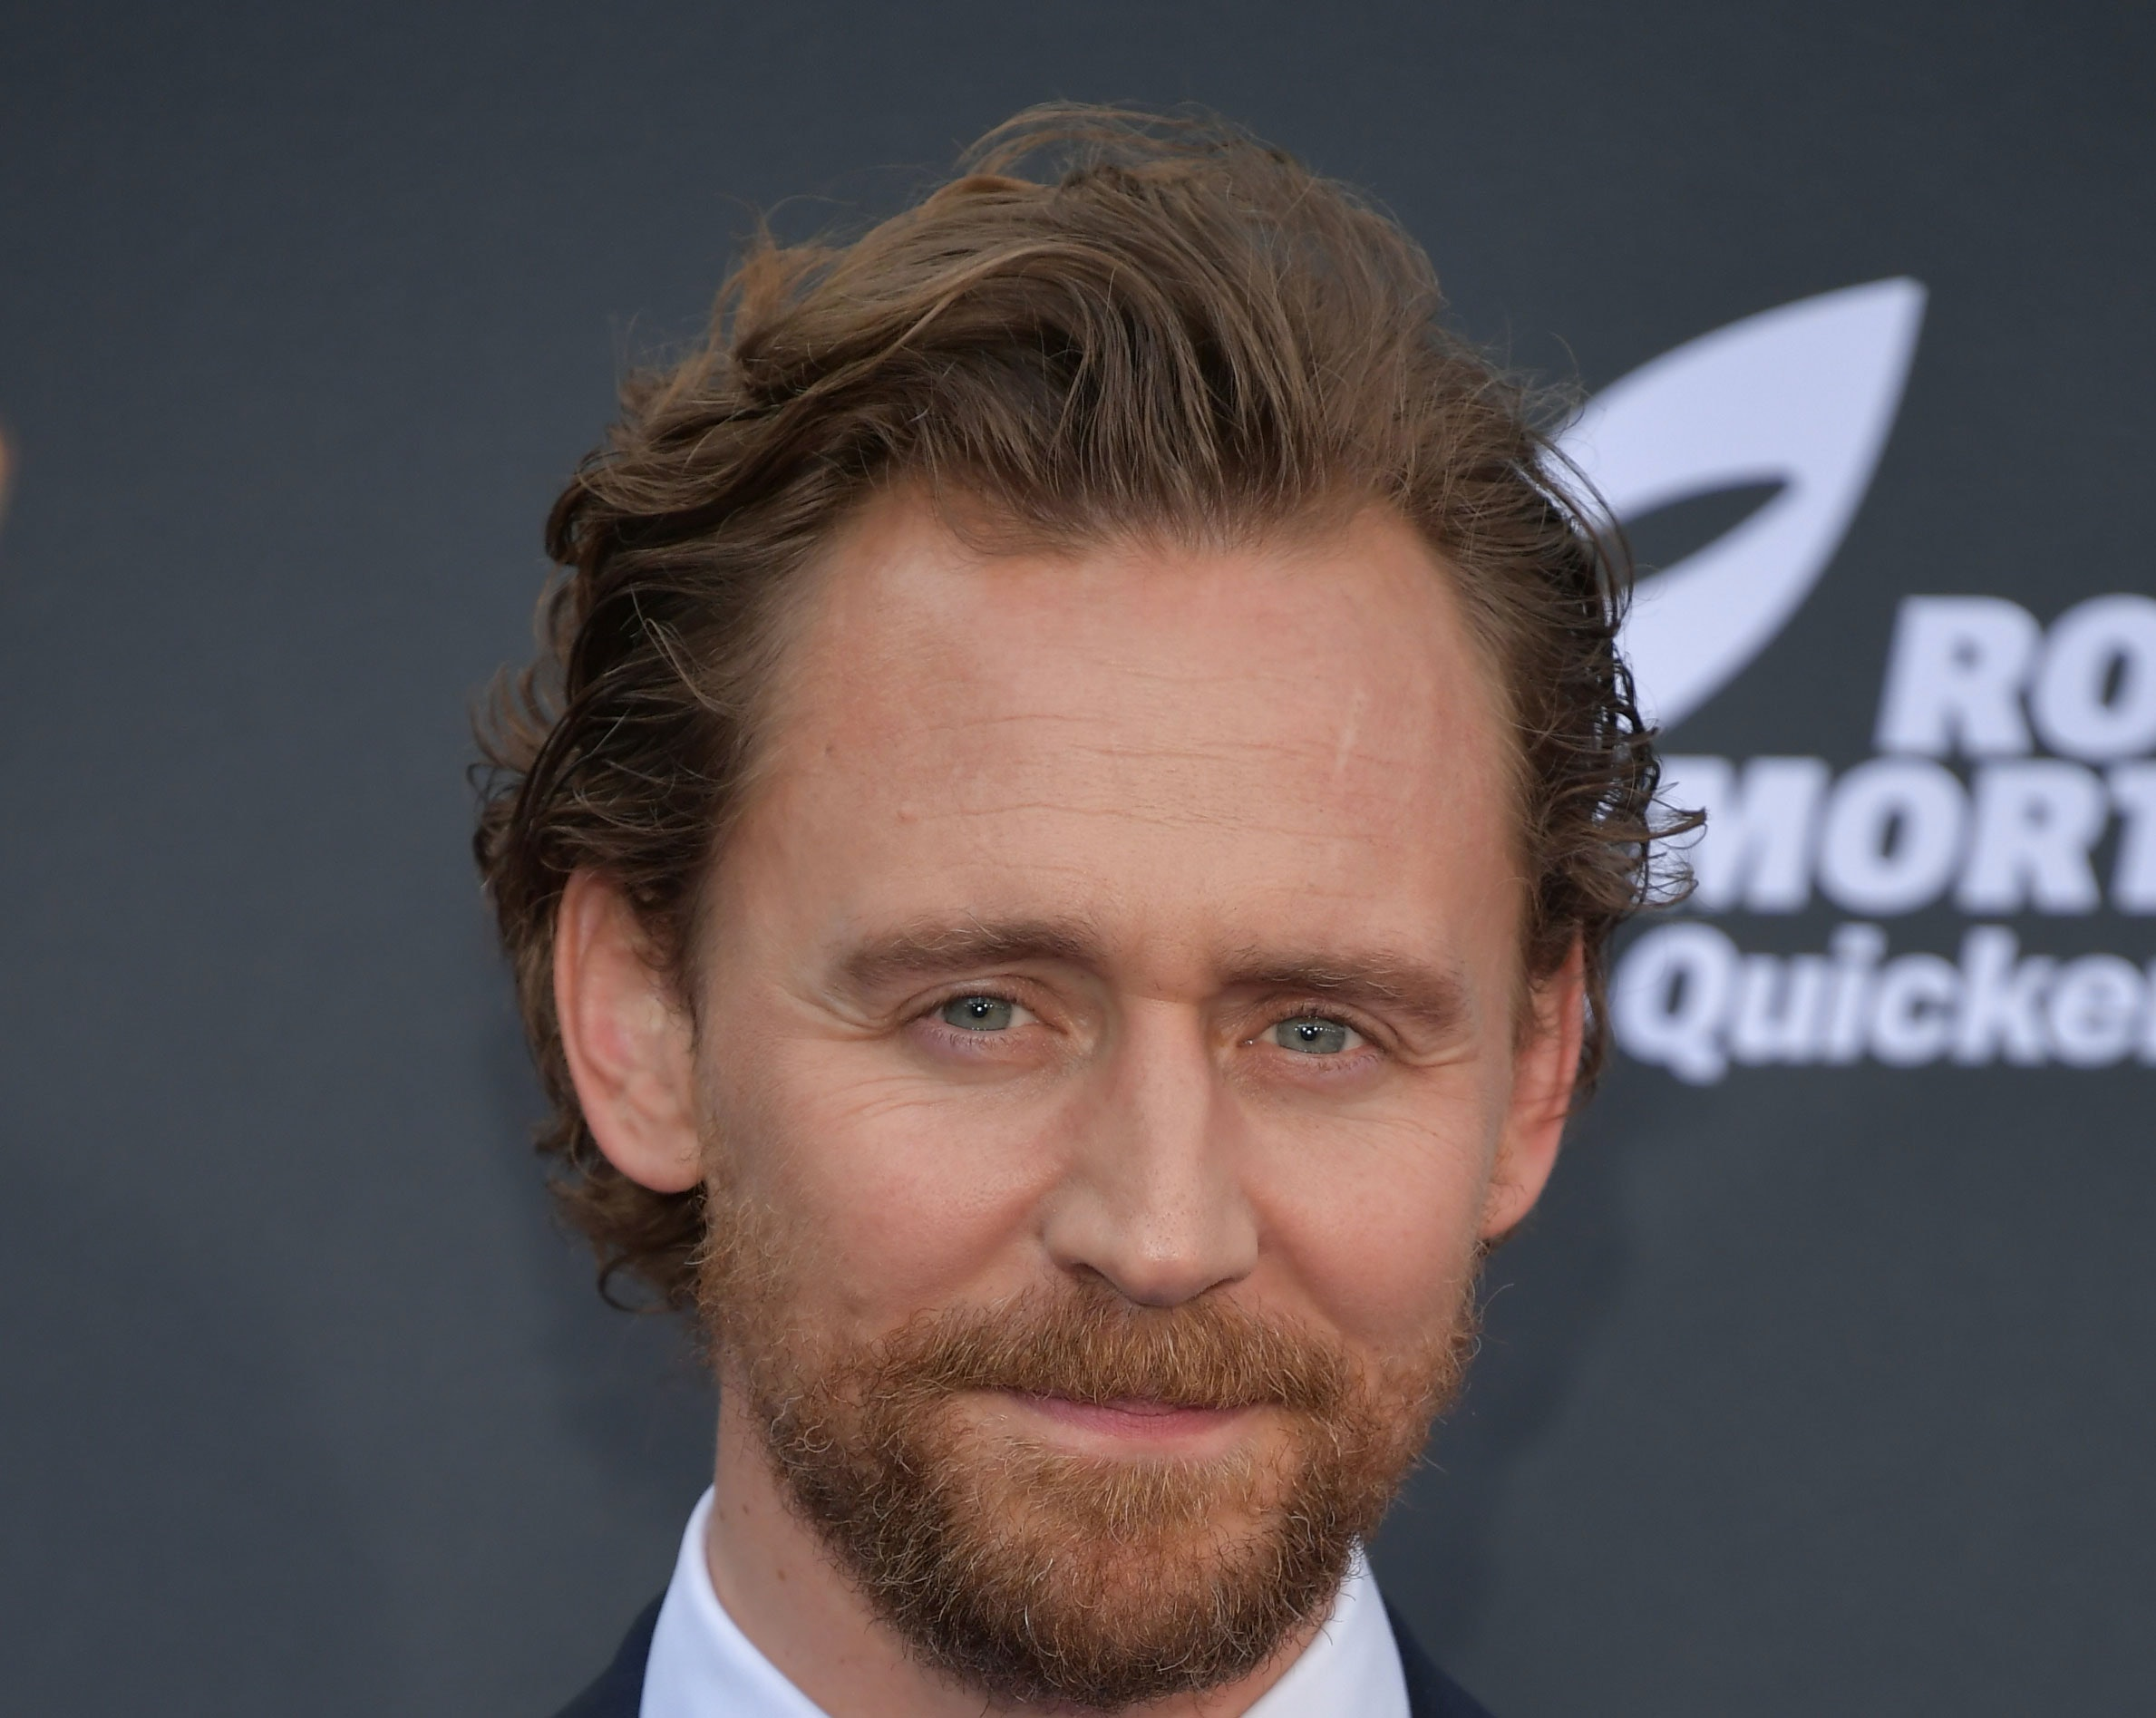 Loki actor dating